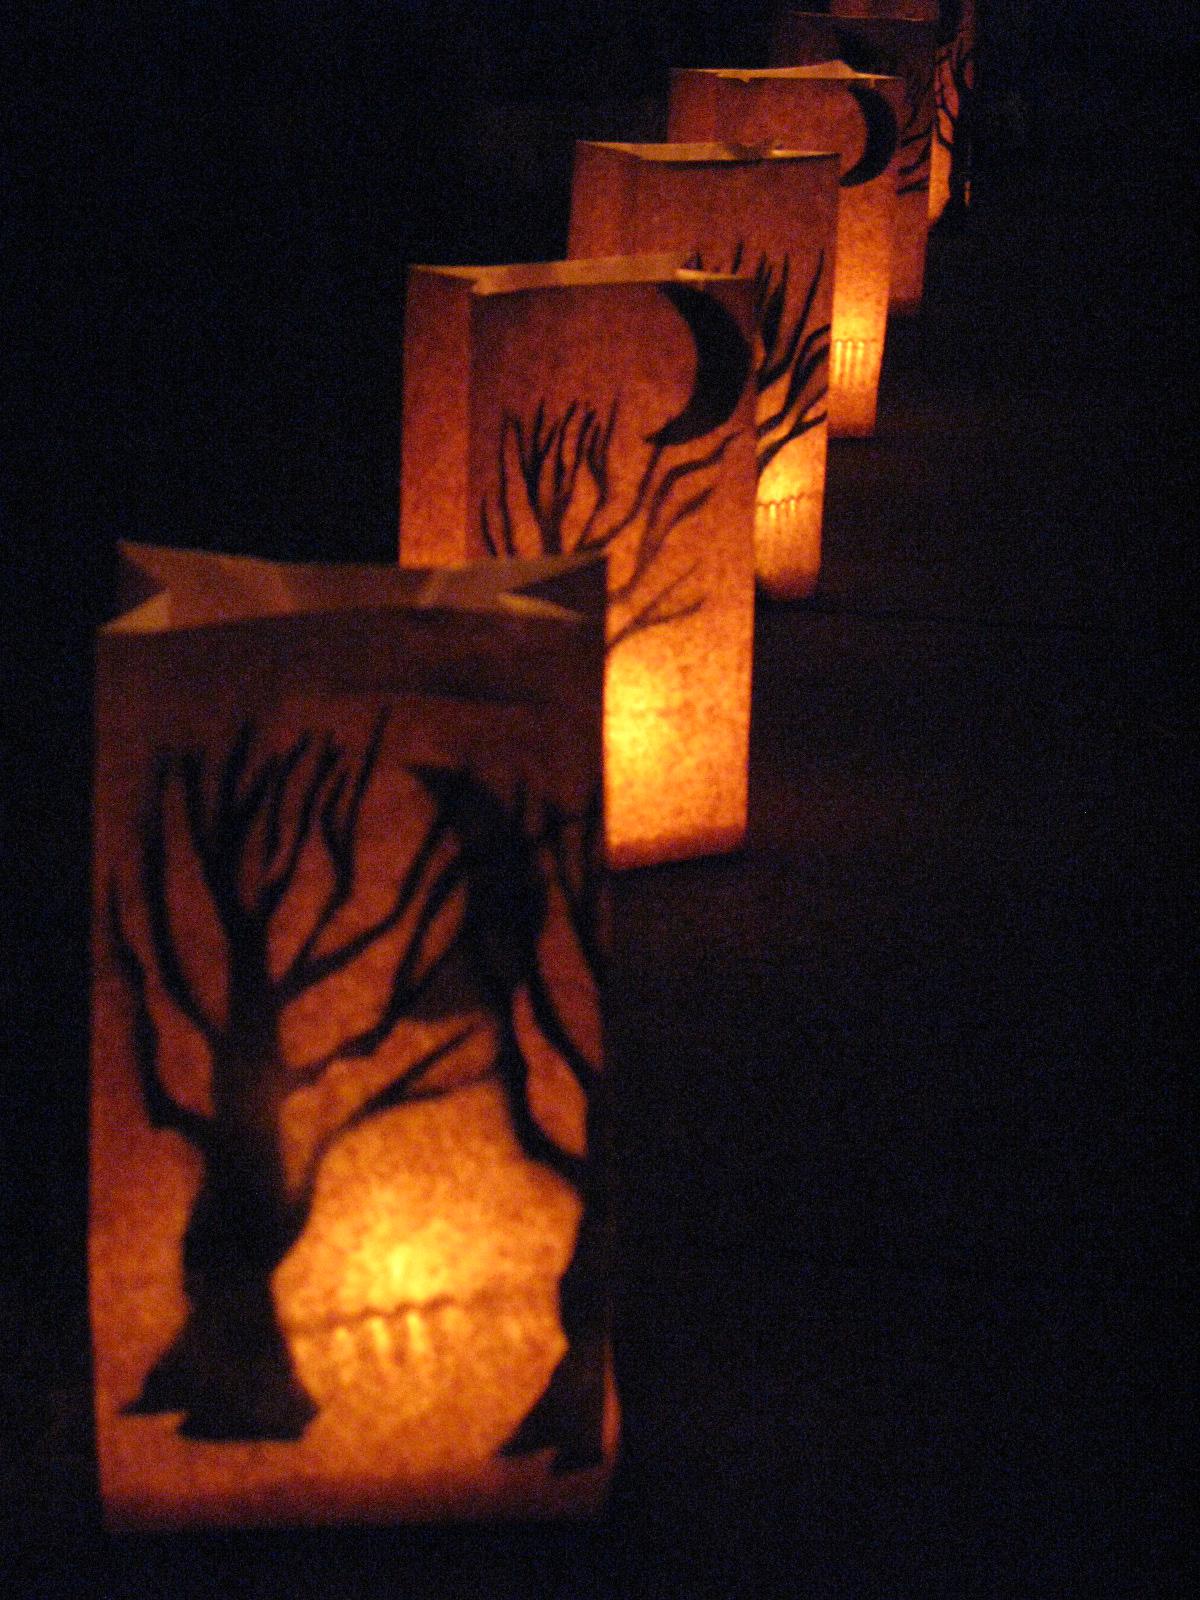 A Sleepy Hollow Halloween